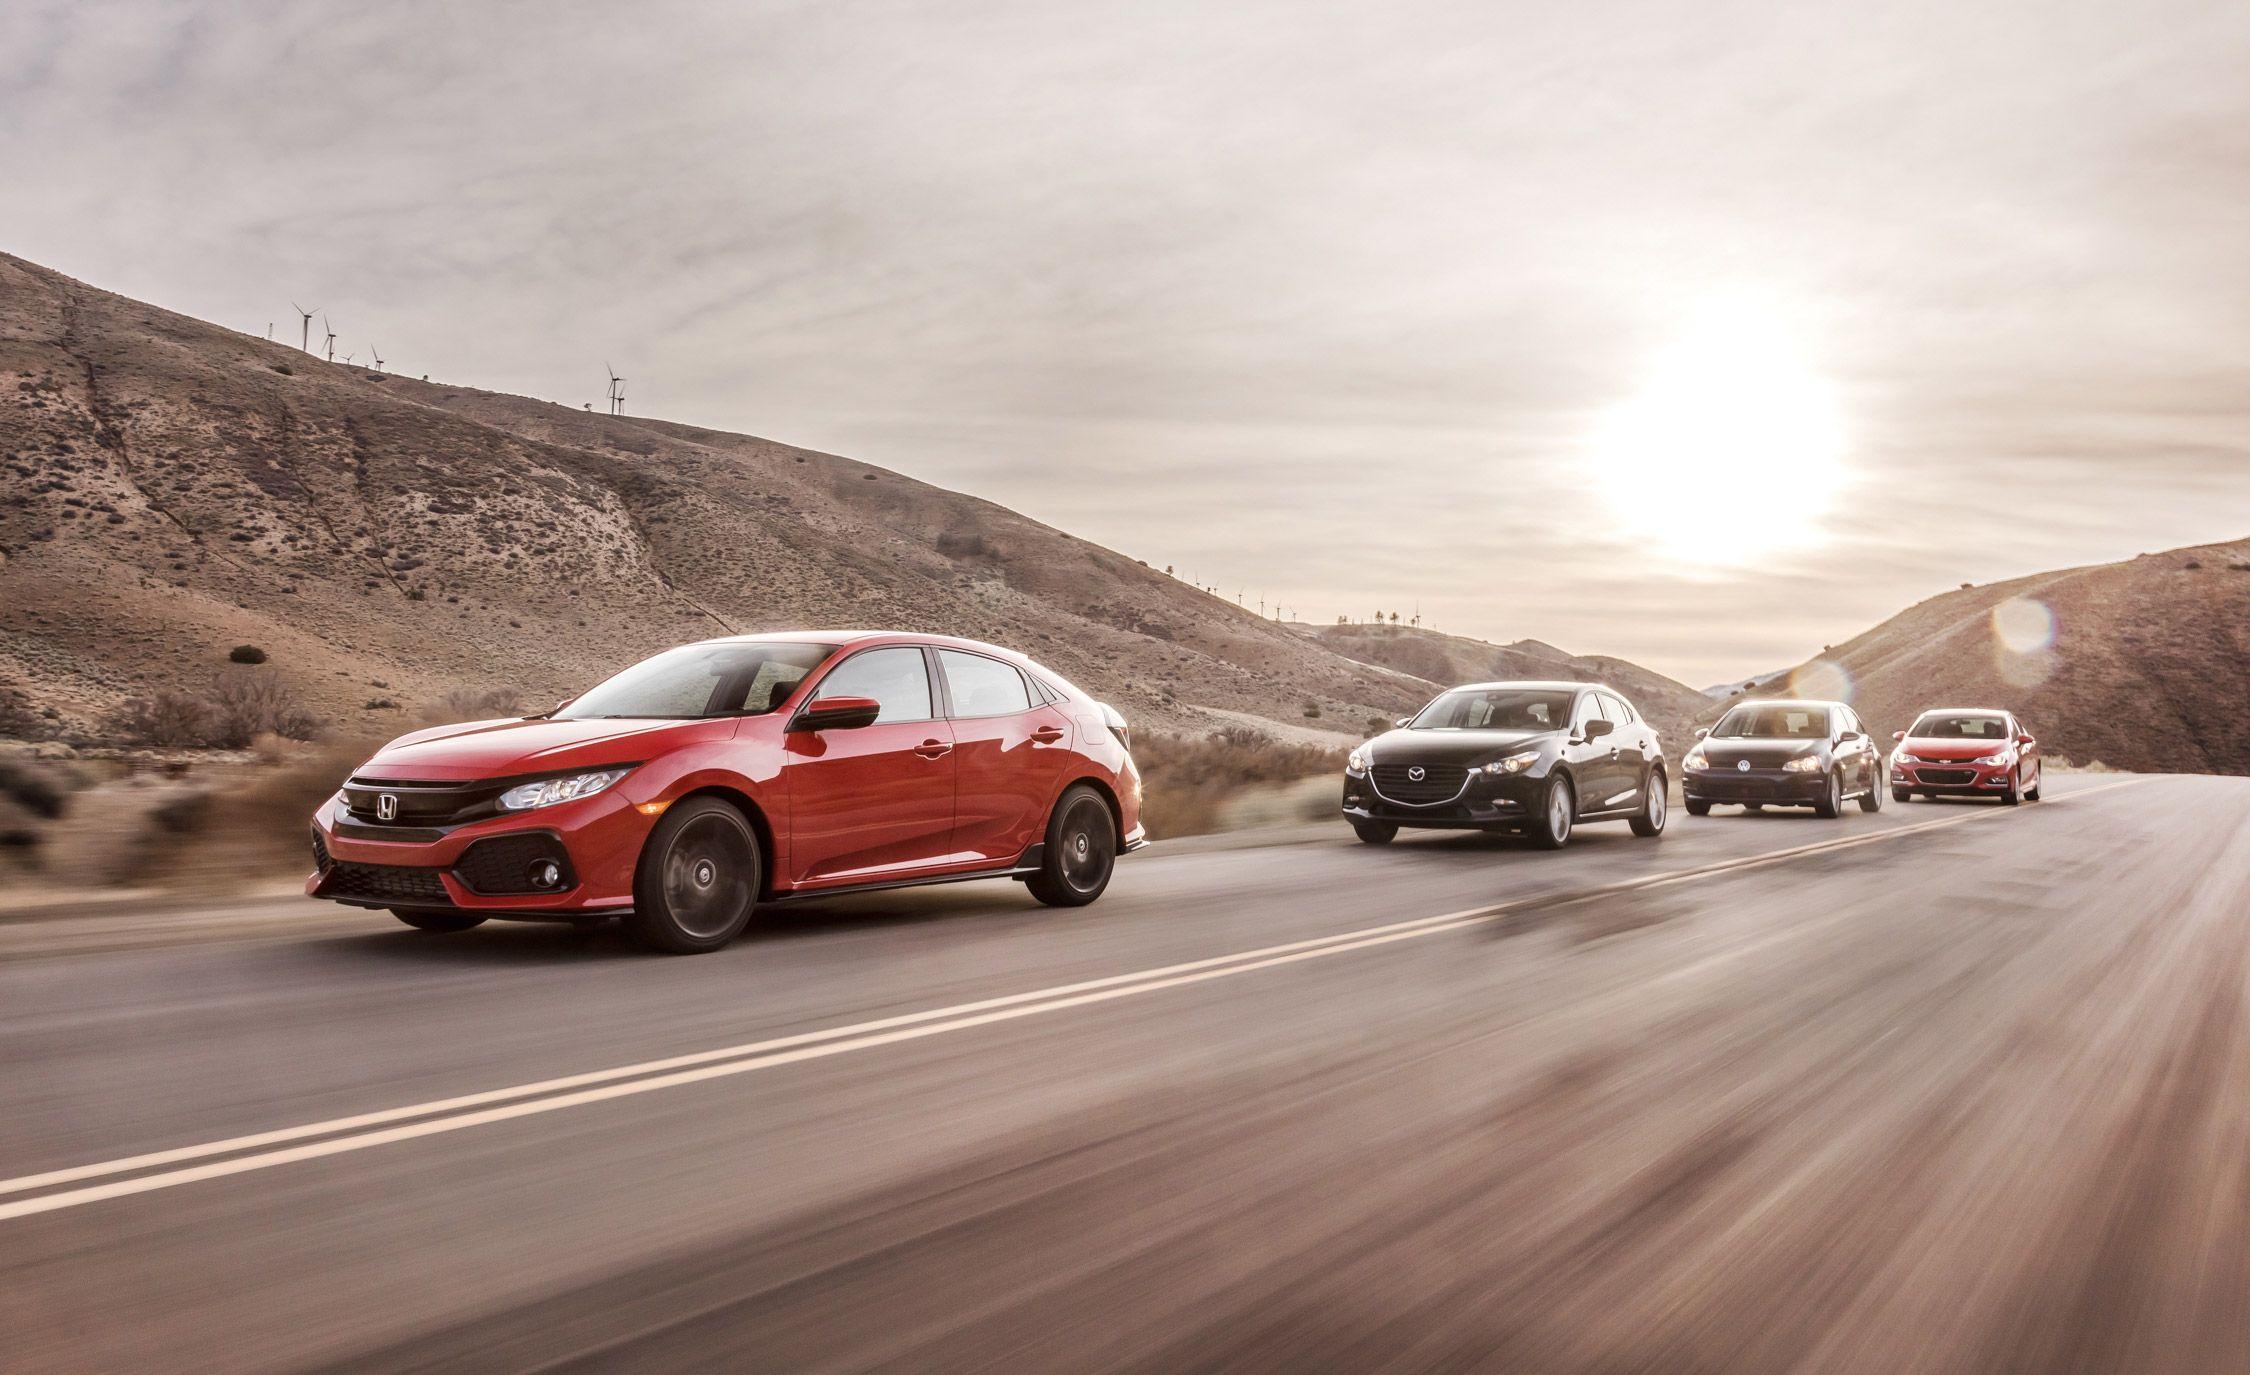 hight resolution of 2017 honda civic hatchback vs chevy cruze mazda 3 vw golfdiagram as well volkswagen